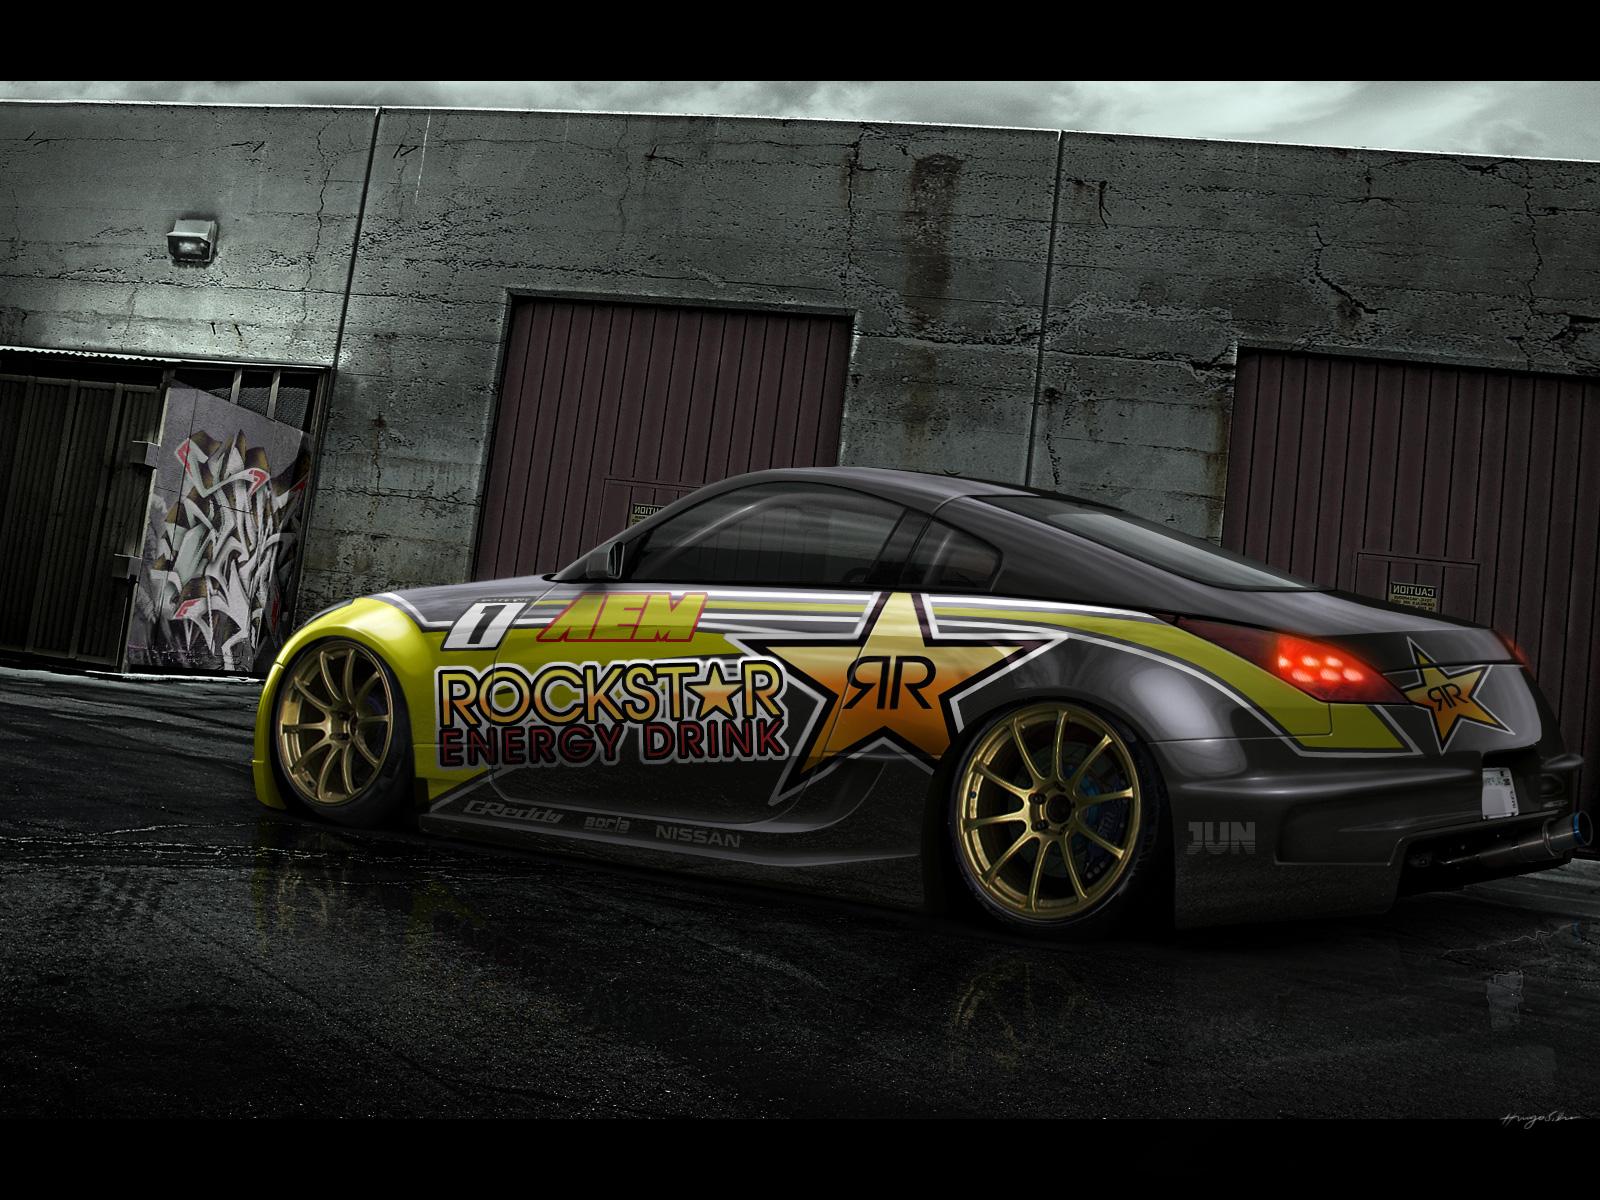 http://3.bp.blogspot.com/-2DD3BeyXl5I/T939oKe5r1I/AAAAAAAAAC0/ulaCoR1g39M/s1600/Wallpaper+HD+Nissan+350Z+Tuning.jpg